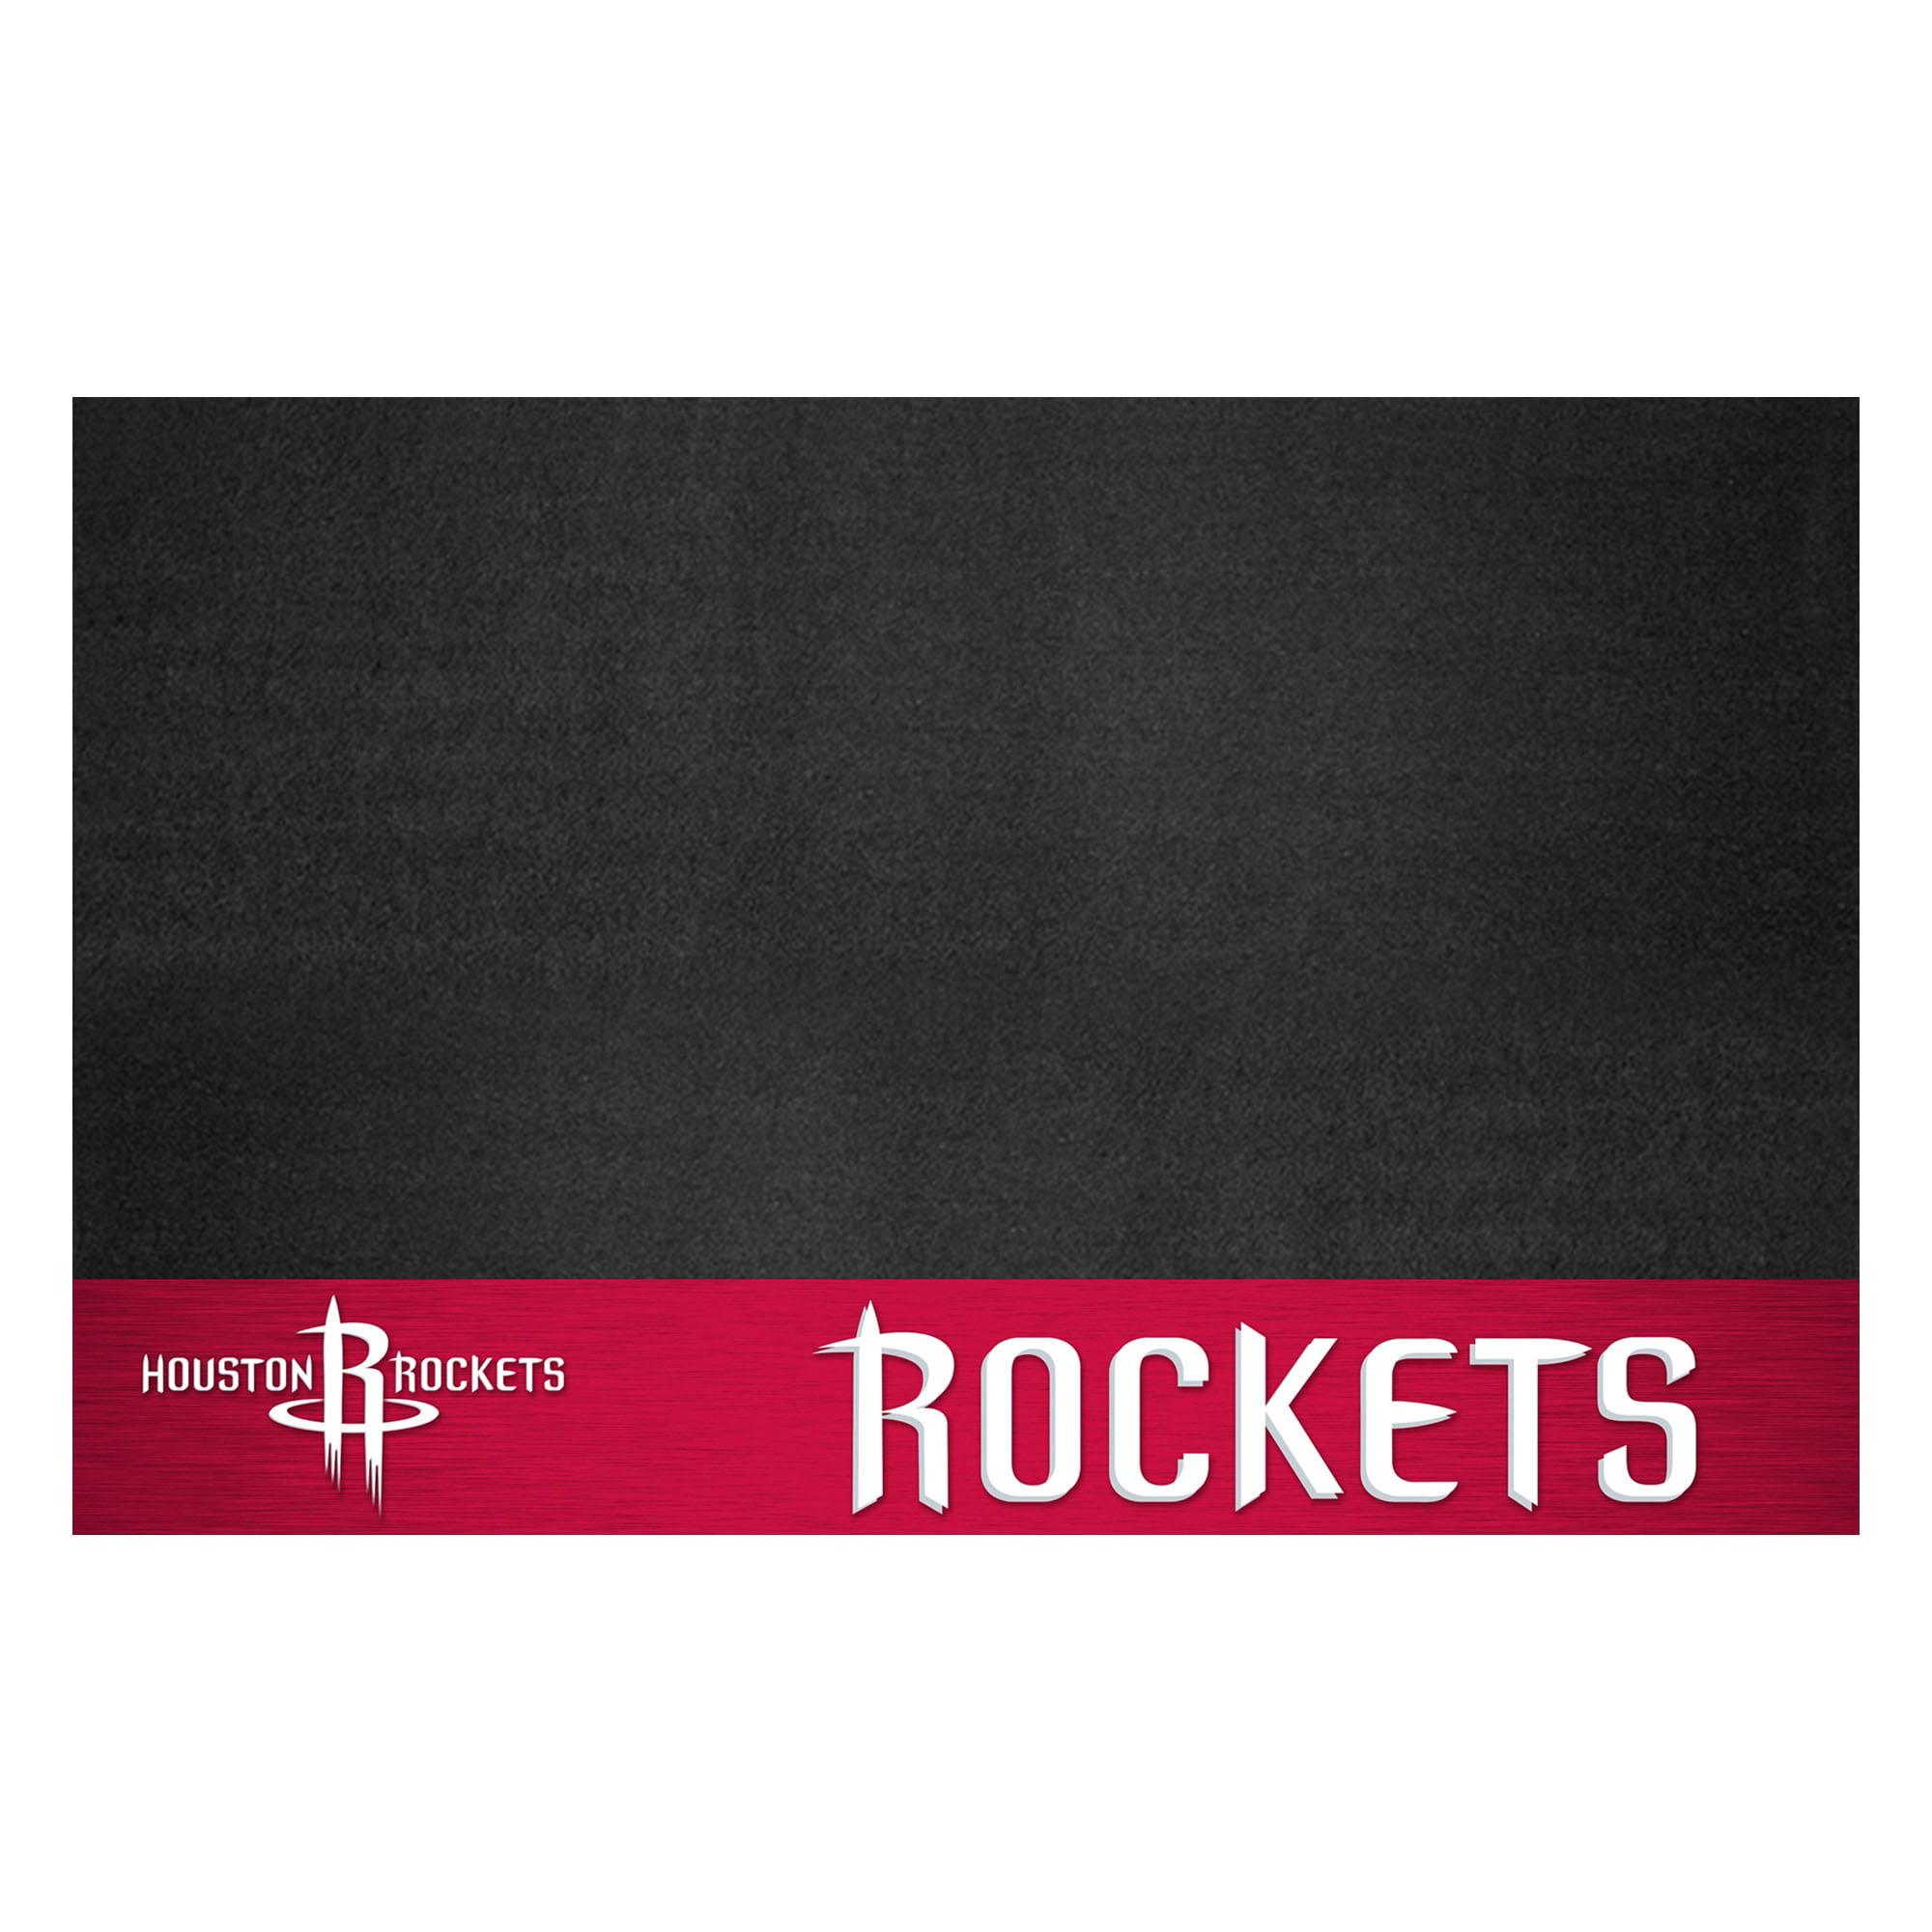 NBA Houston Rockets Grill Mat Tailgate Accessory